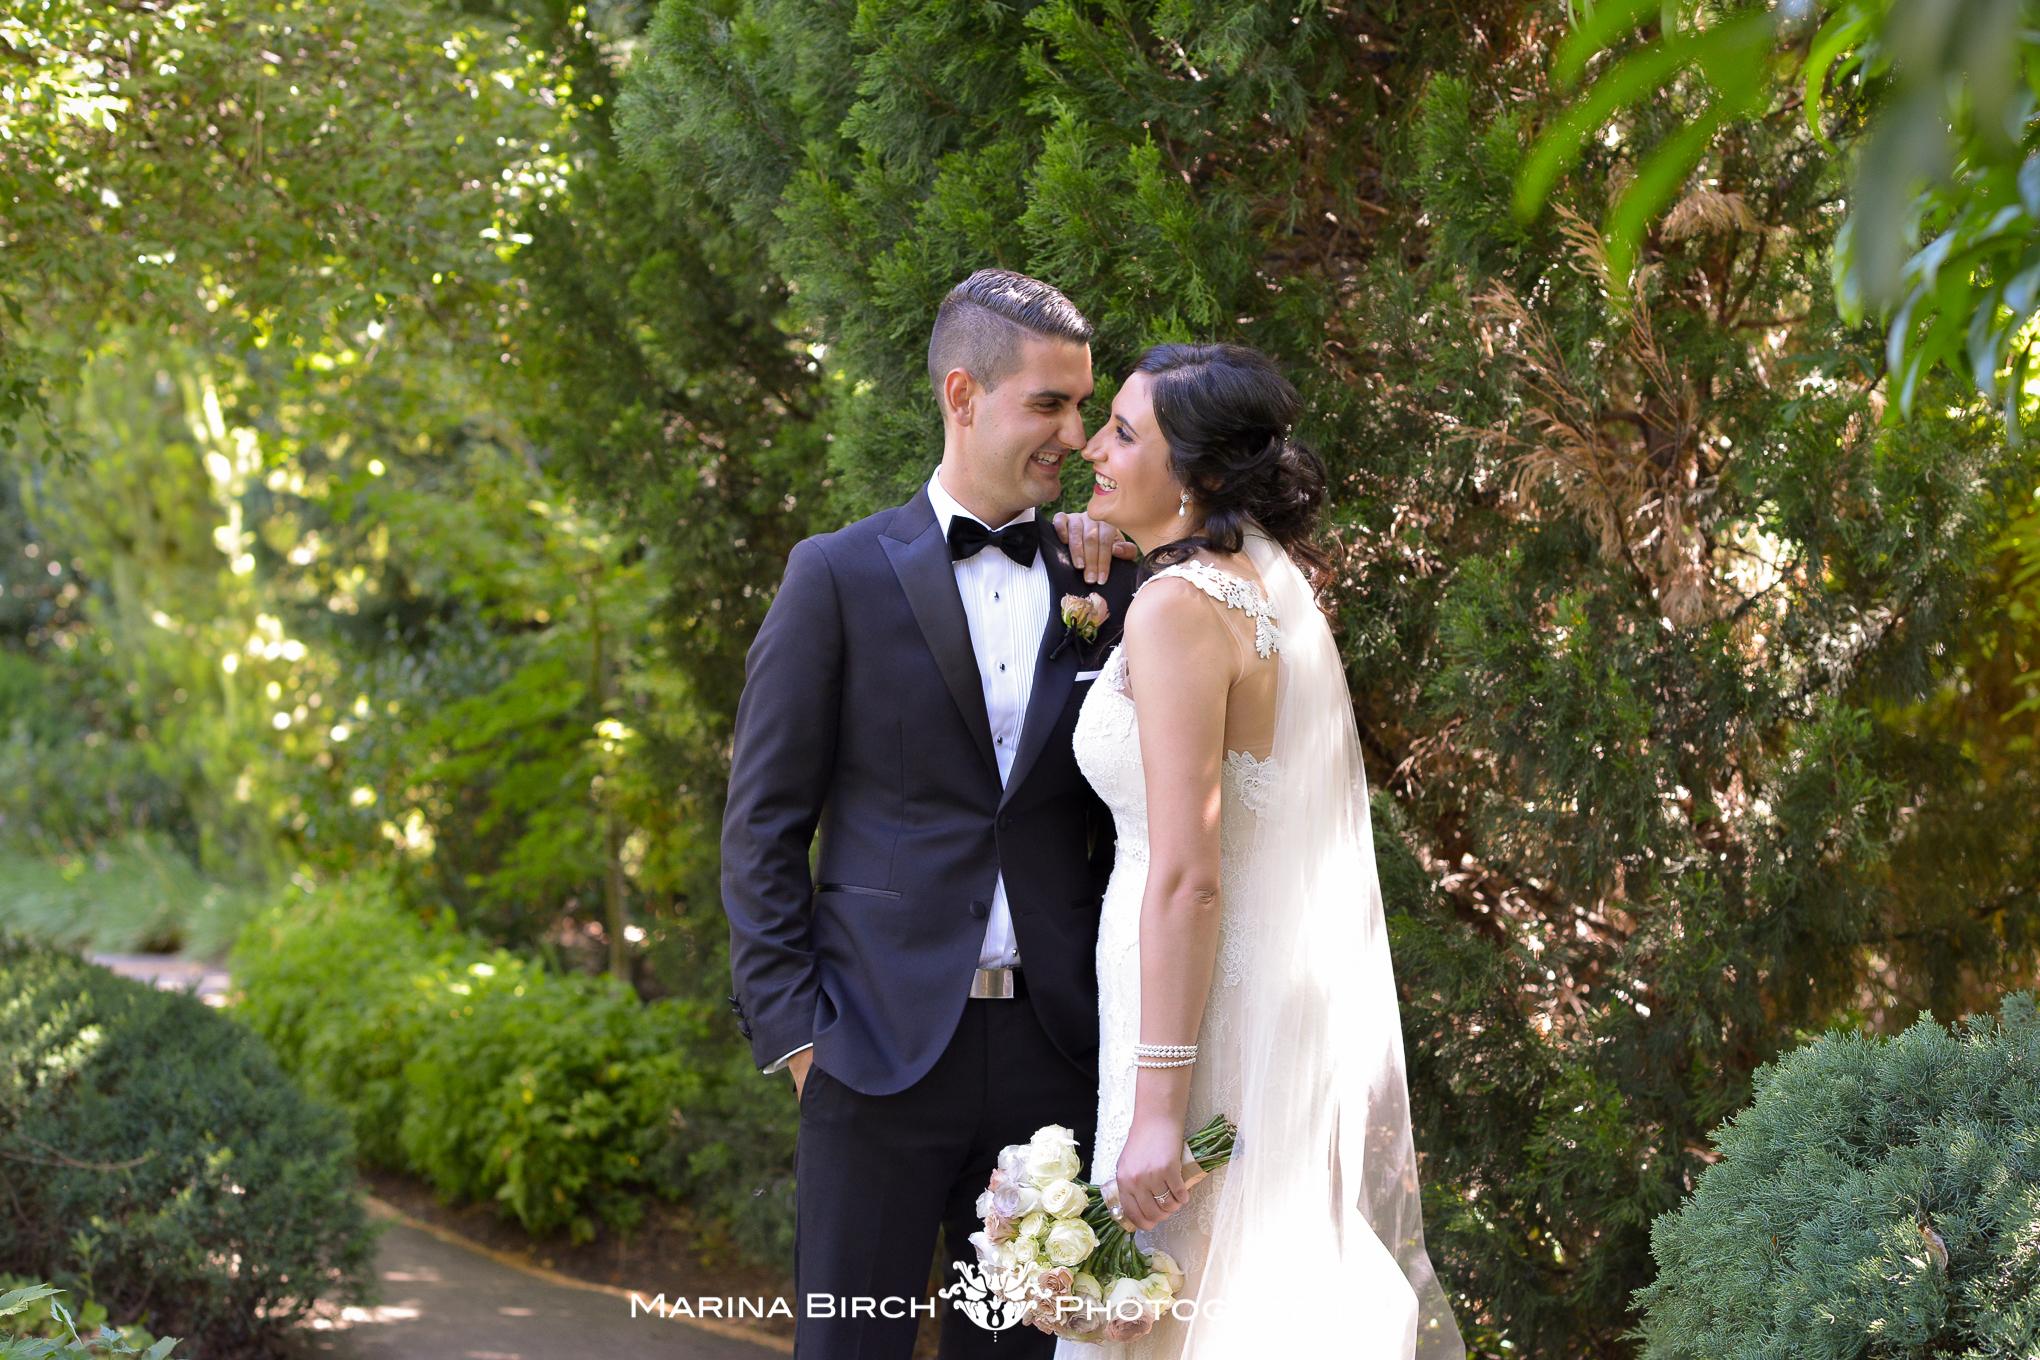 MBP.Lava wedding -13.jpg